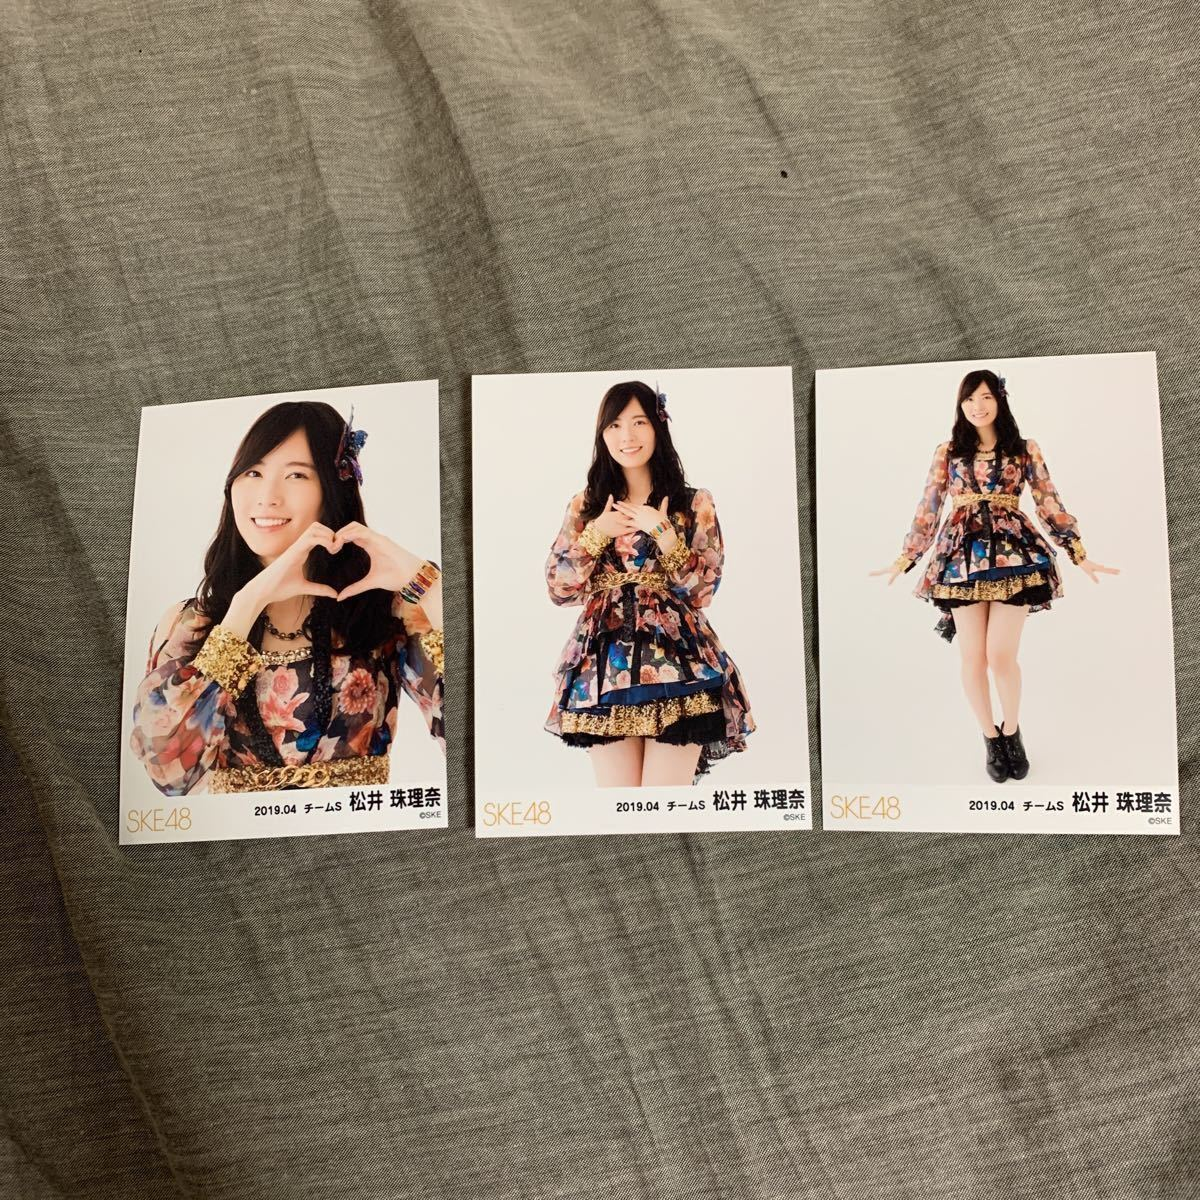 SKE48 松井珠理奈 2019年4月度 月別 ランダム 生写真 3枚 コンプ